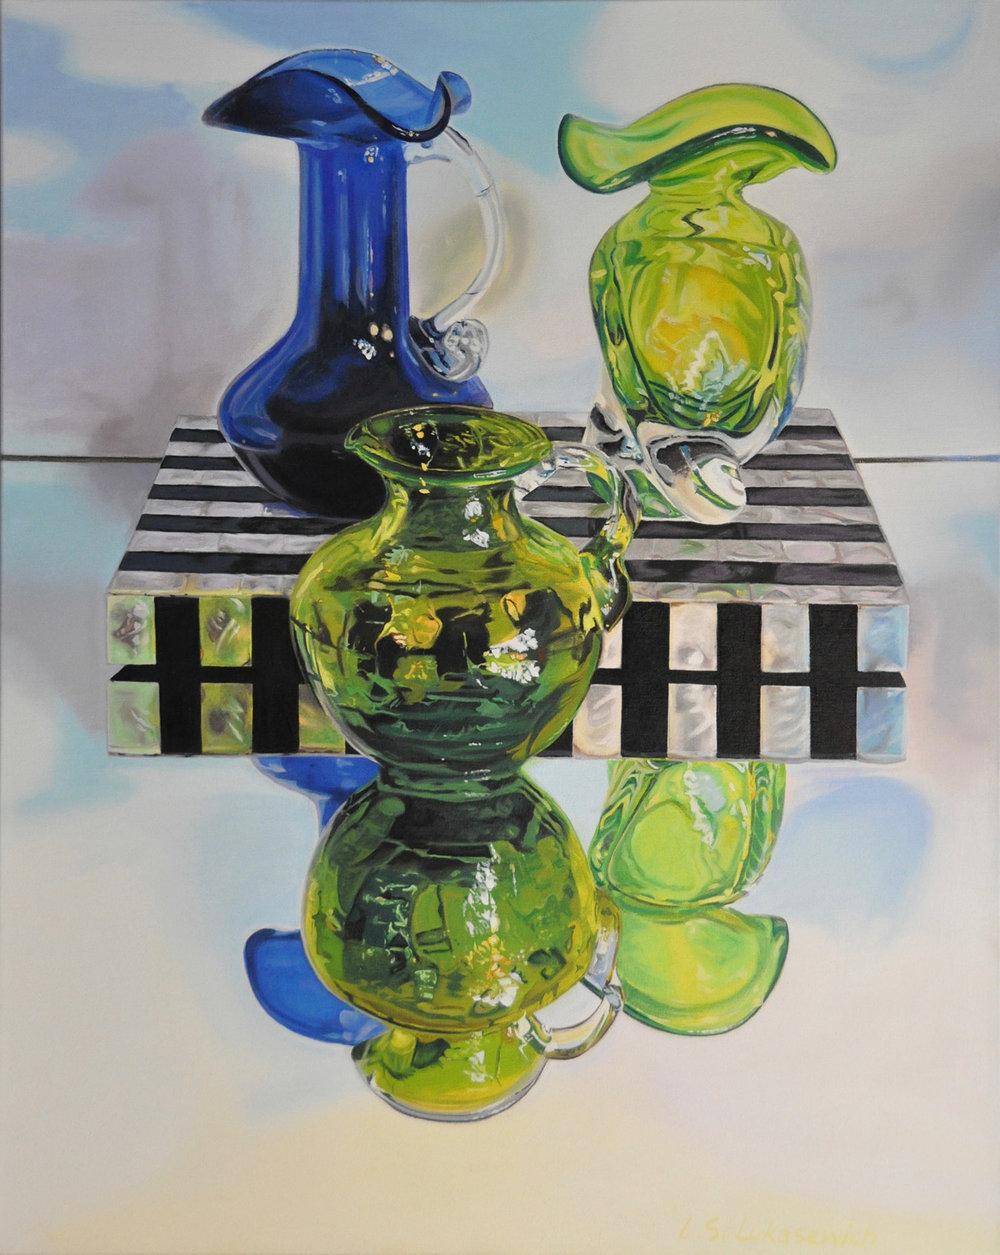 Zoya's Blue & Green Glass, oil & alkyd on canvas, 30 x 24 in.